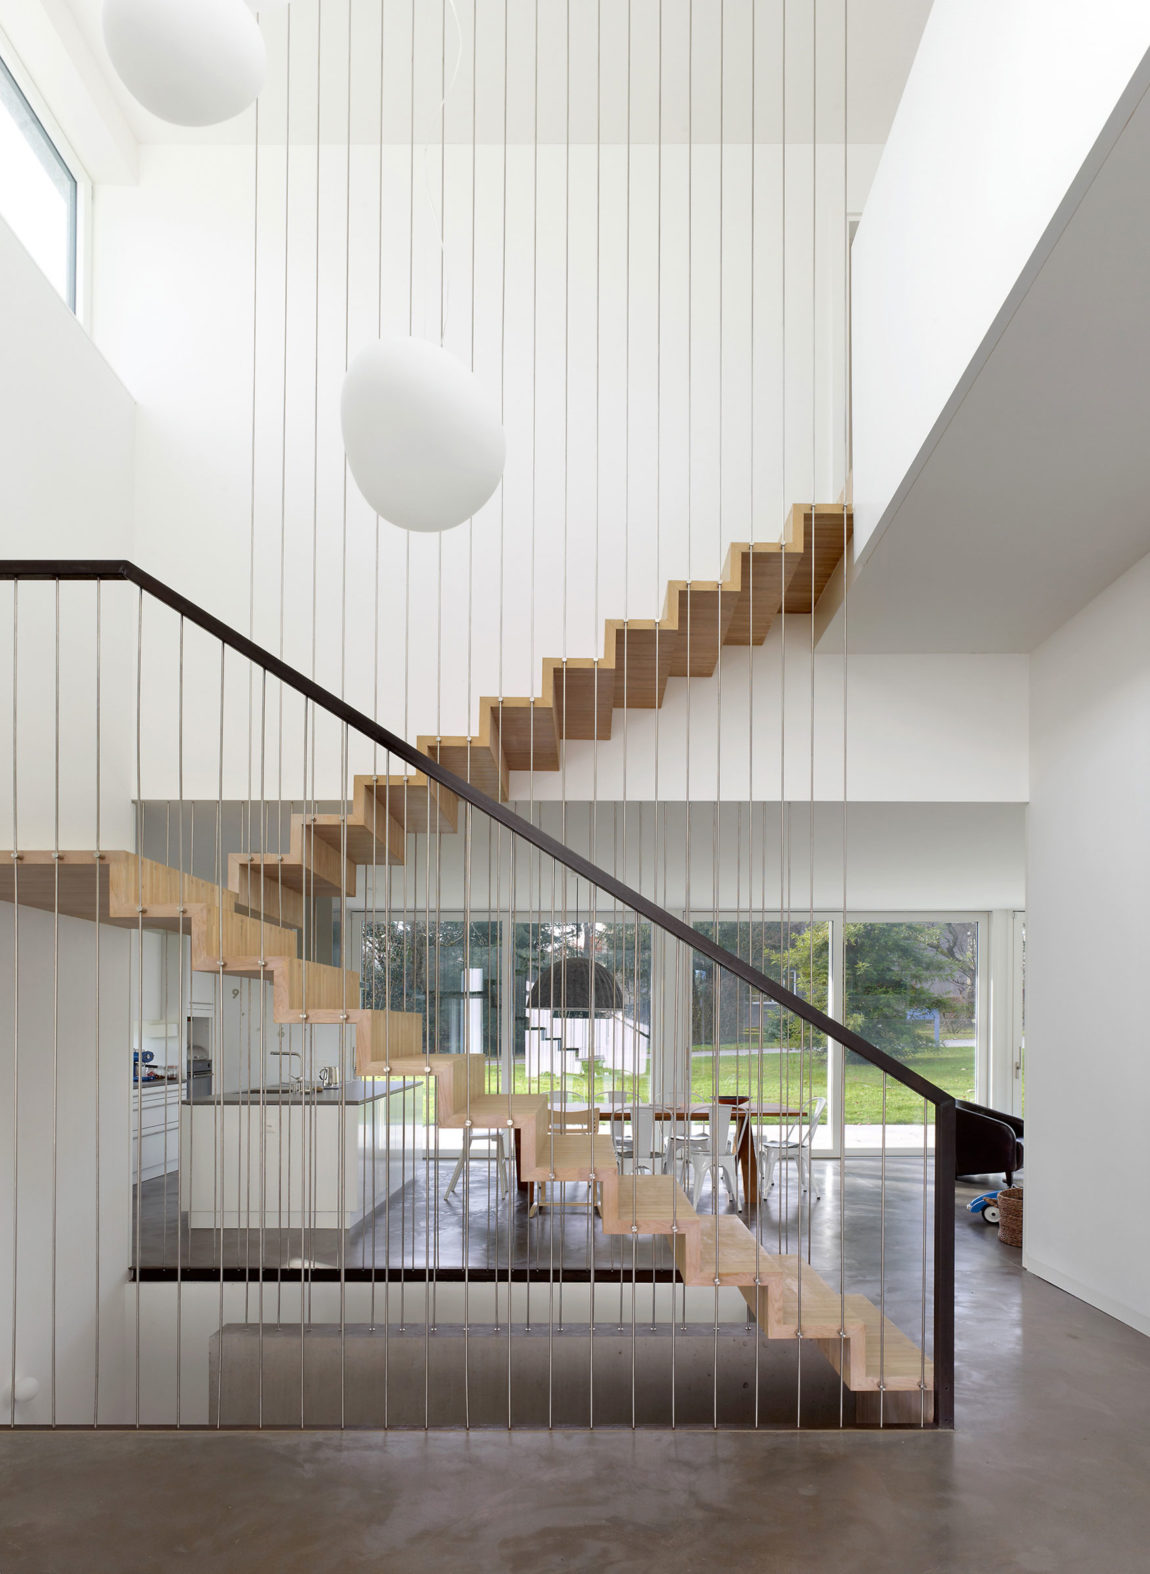 A Single Family House by Christian von Düring architecte (12)